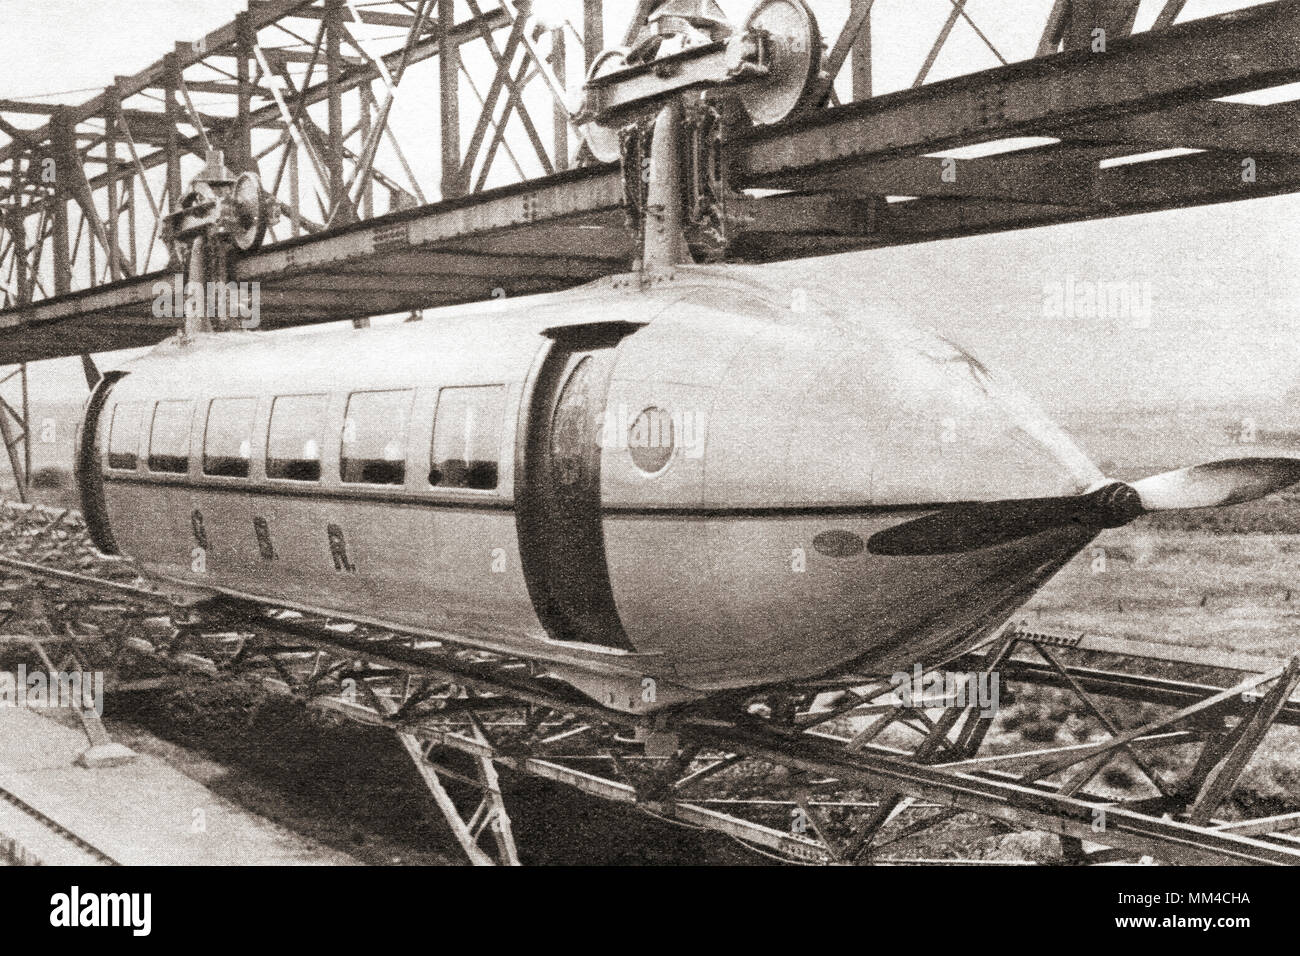 Rail Transport Stock Photos & Rail Transport Stock Images - Alamy